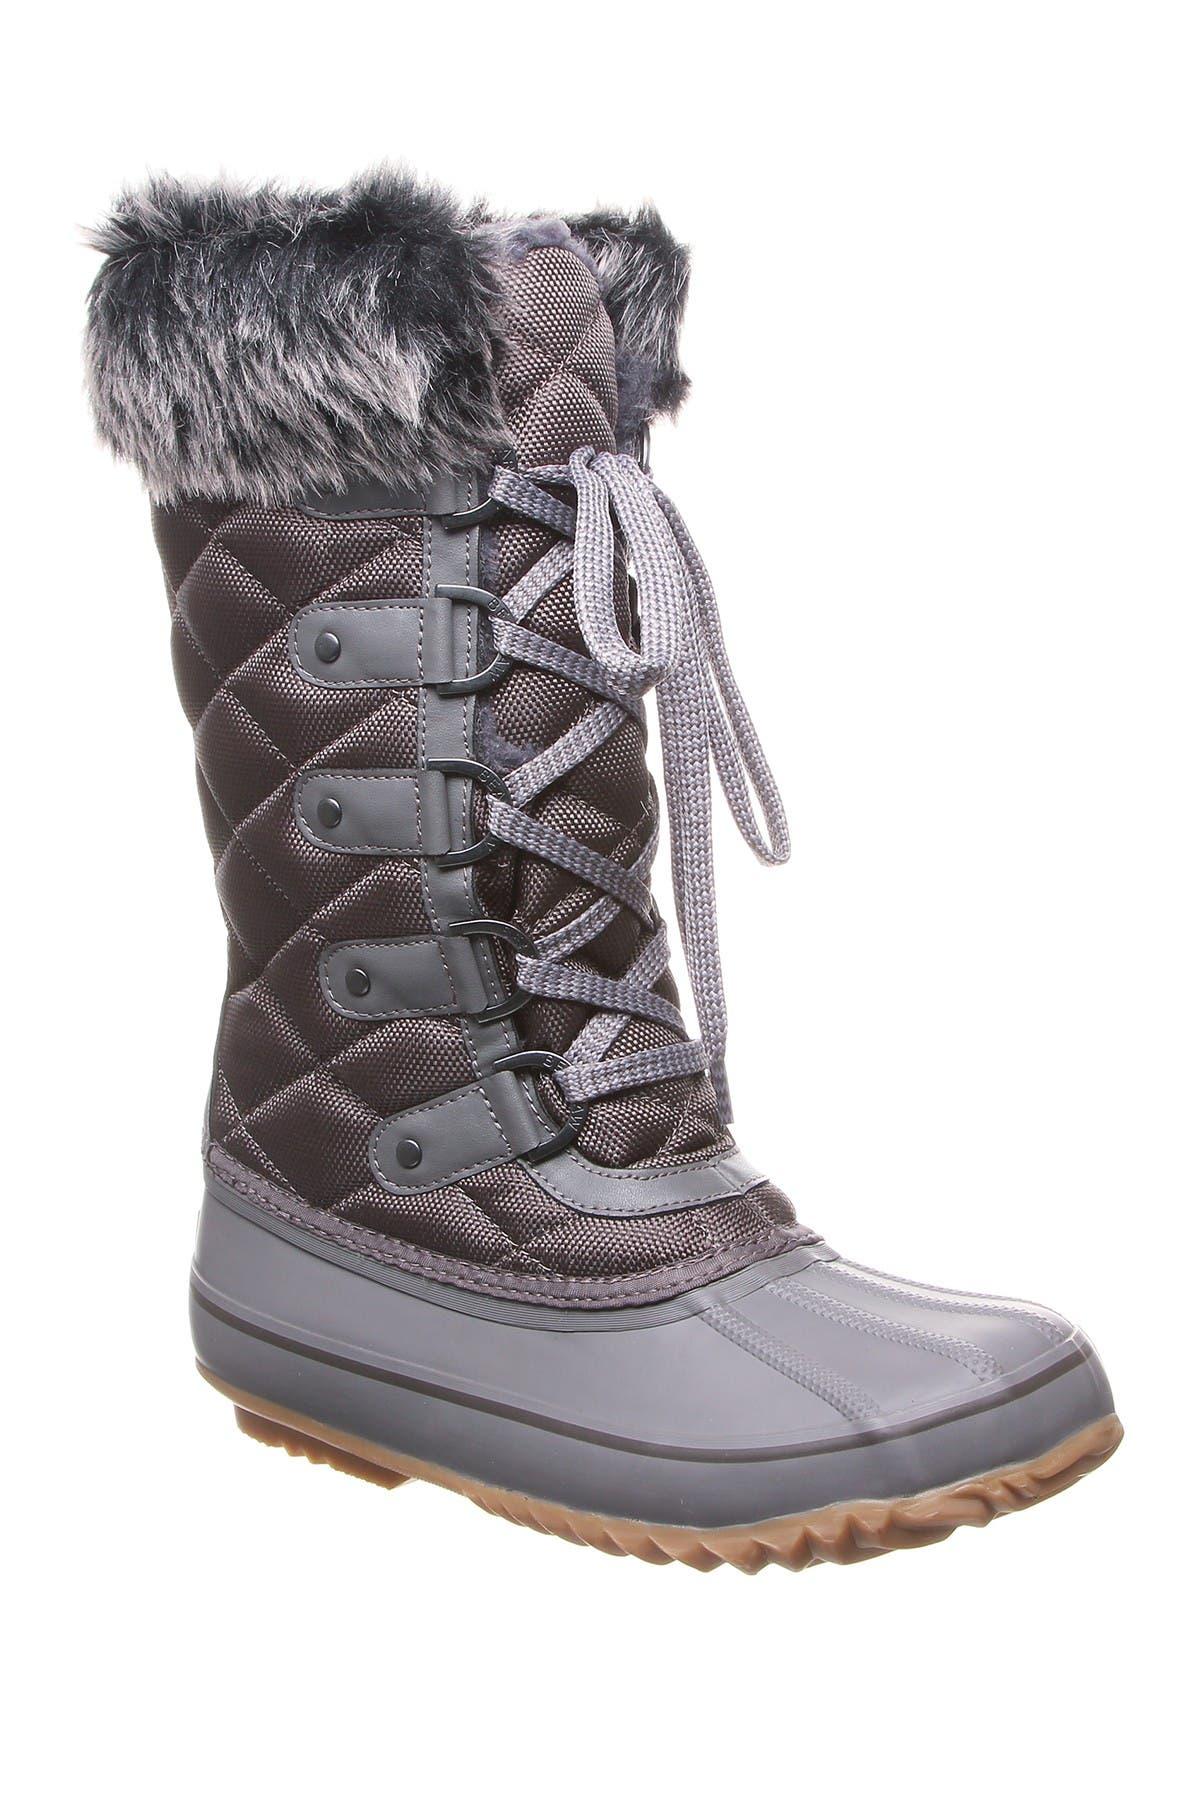 Image of BEARPAW McKinley Faux Fur & Genuine Sheepskin Waterproof Quilted Boot